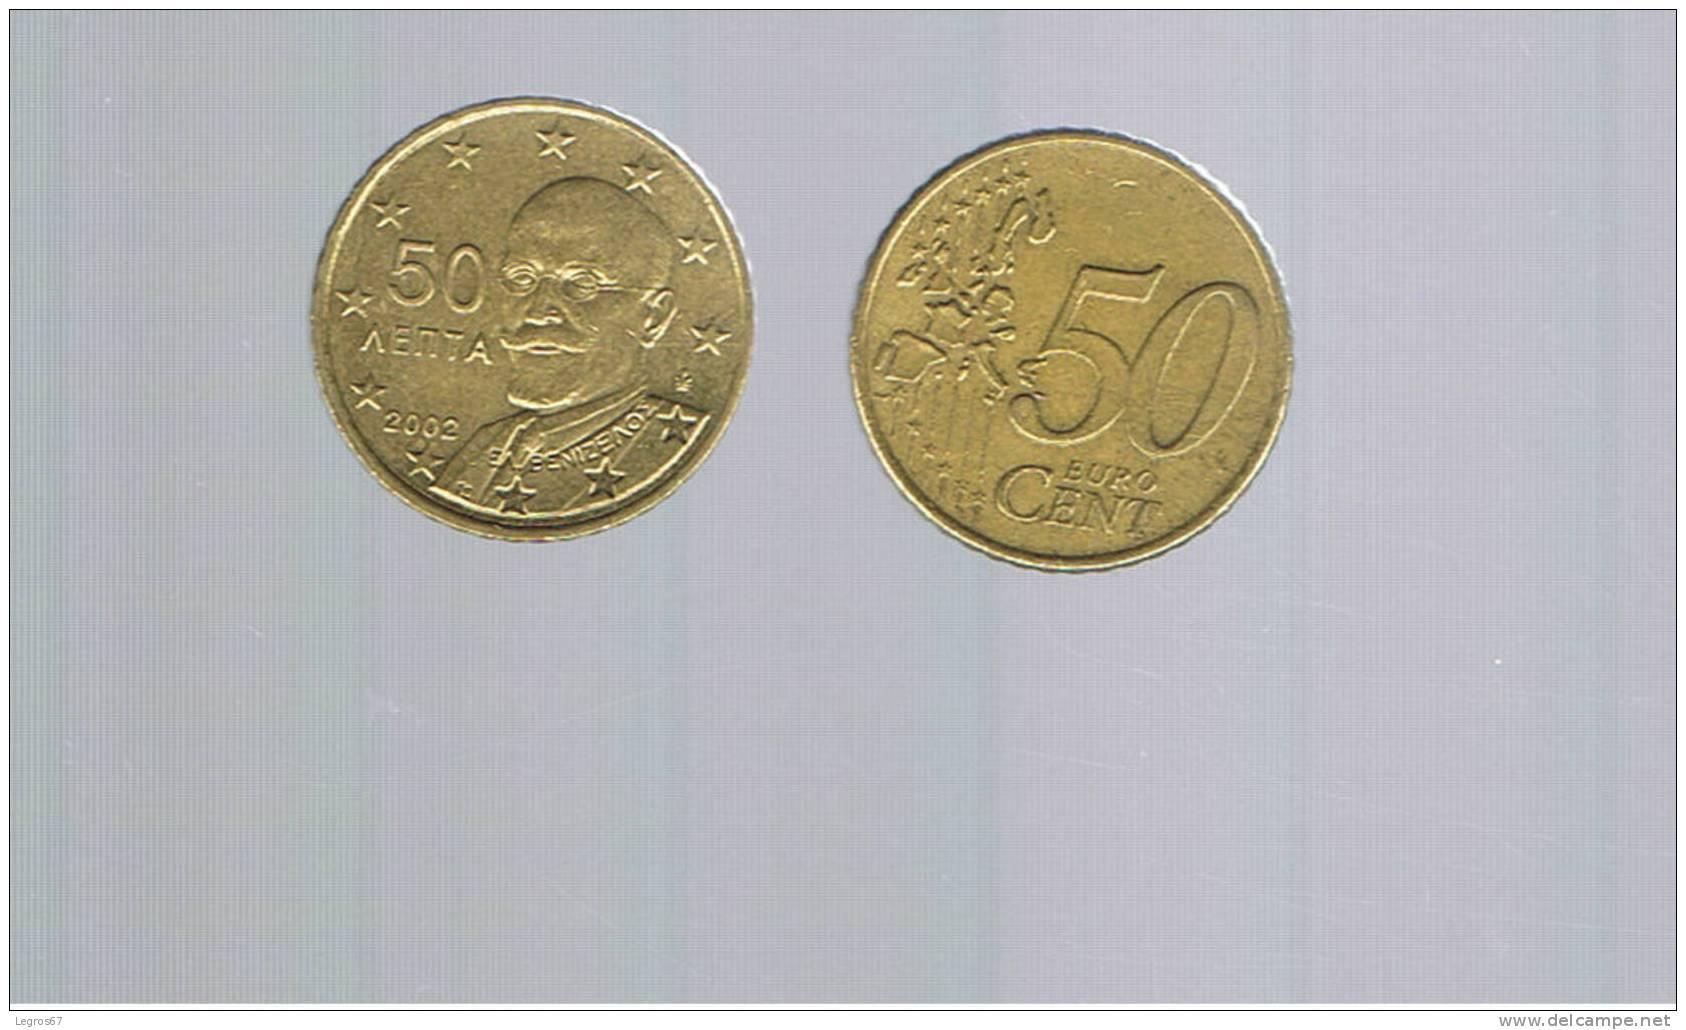 PIECE DE 50 CT EURO GRECE 2002 - Grèce